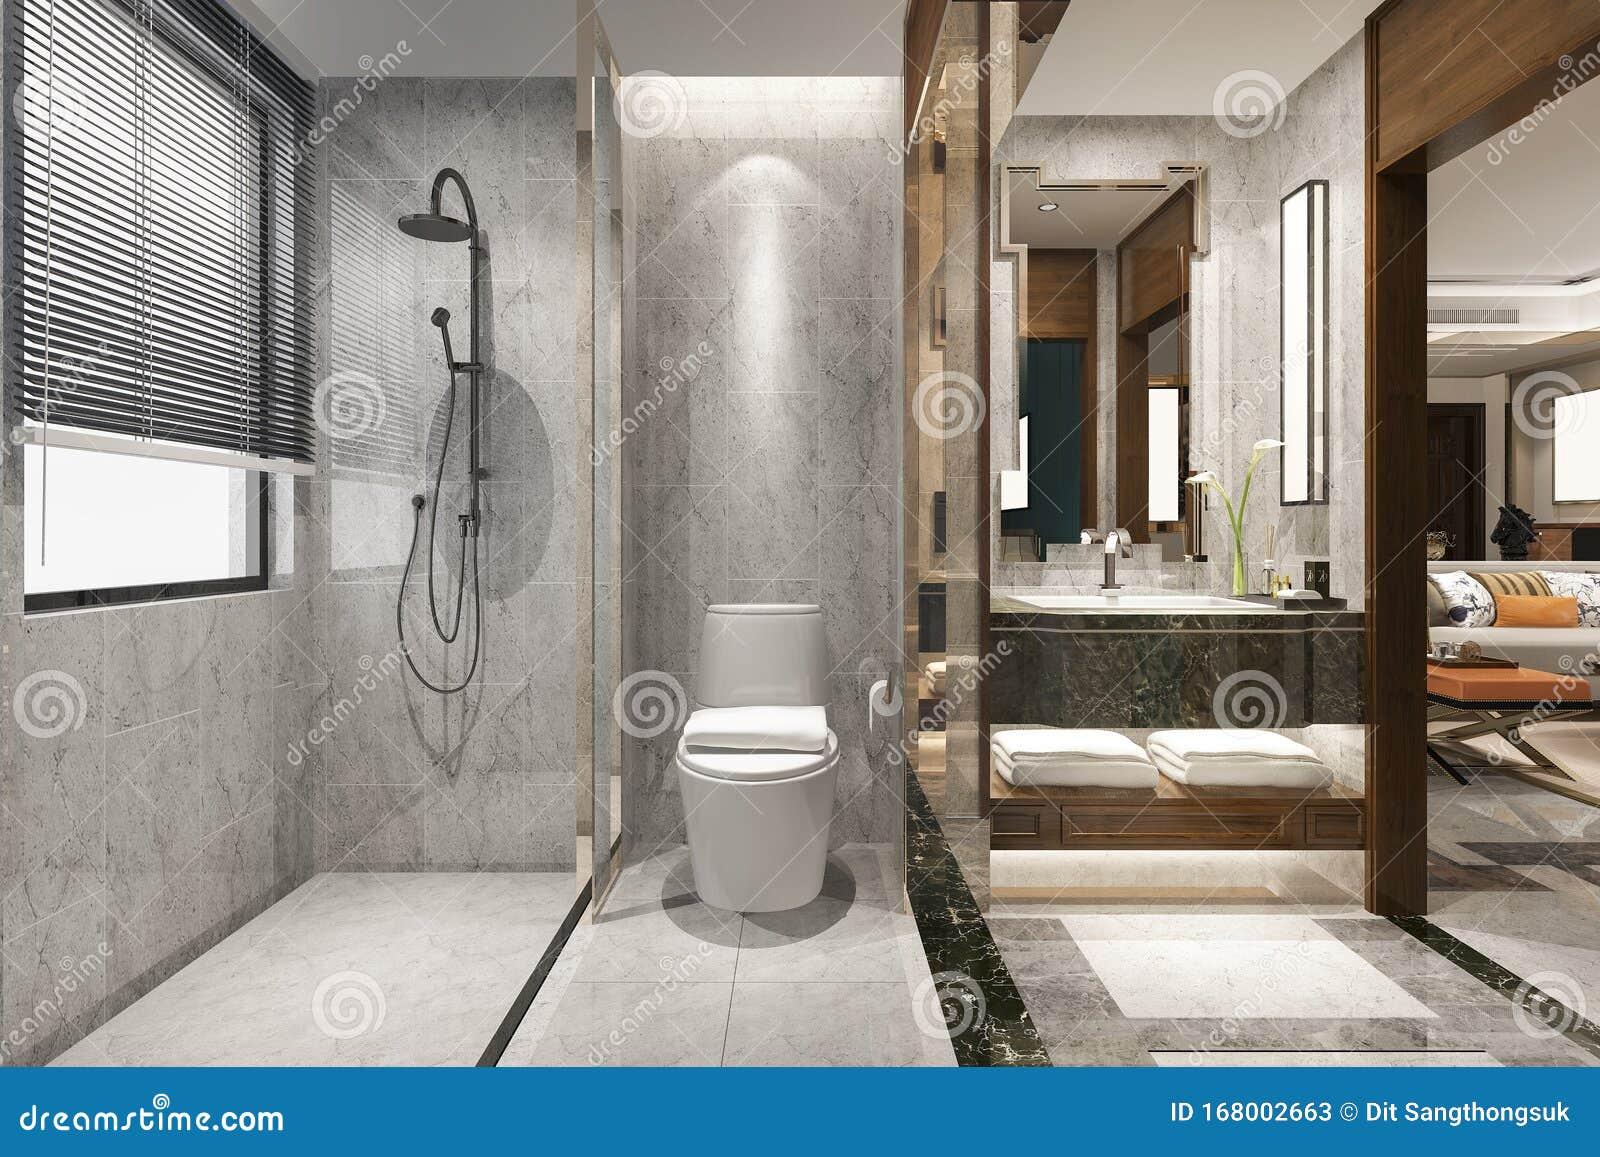 3d Rendering Classic Modern Bathroom With Luxury Tile Decor Near Living Room Stock Image Image Of Floor Bathroom 168002663